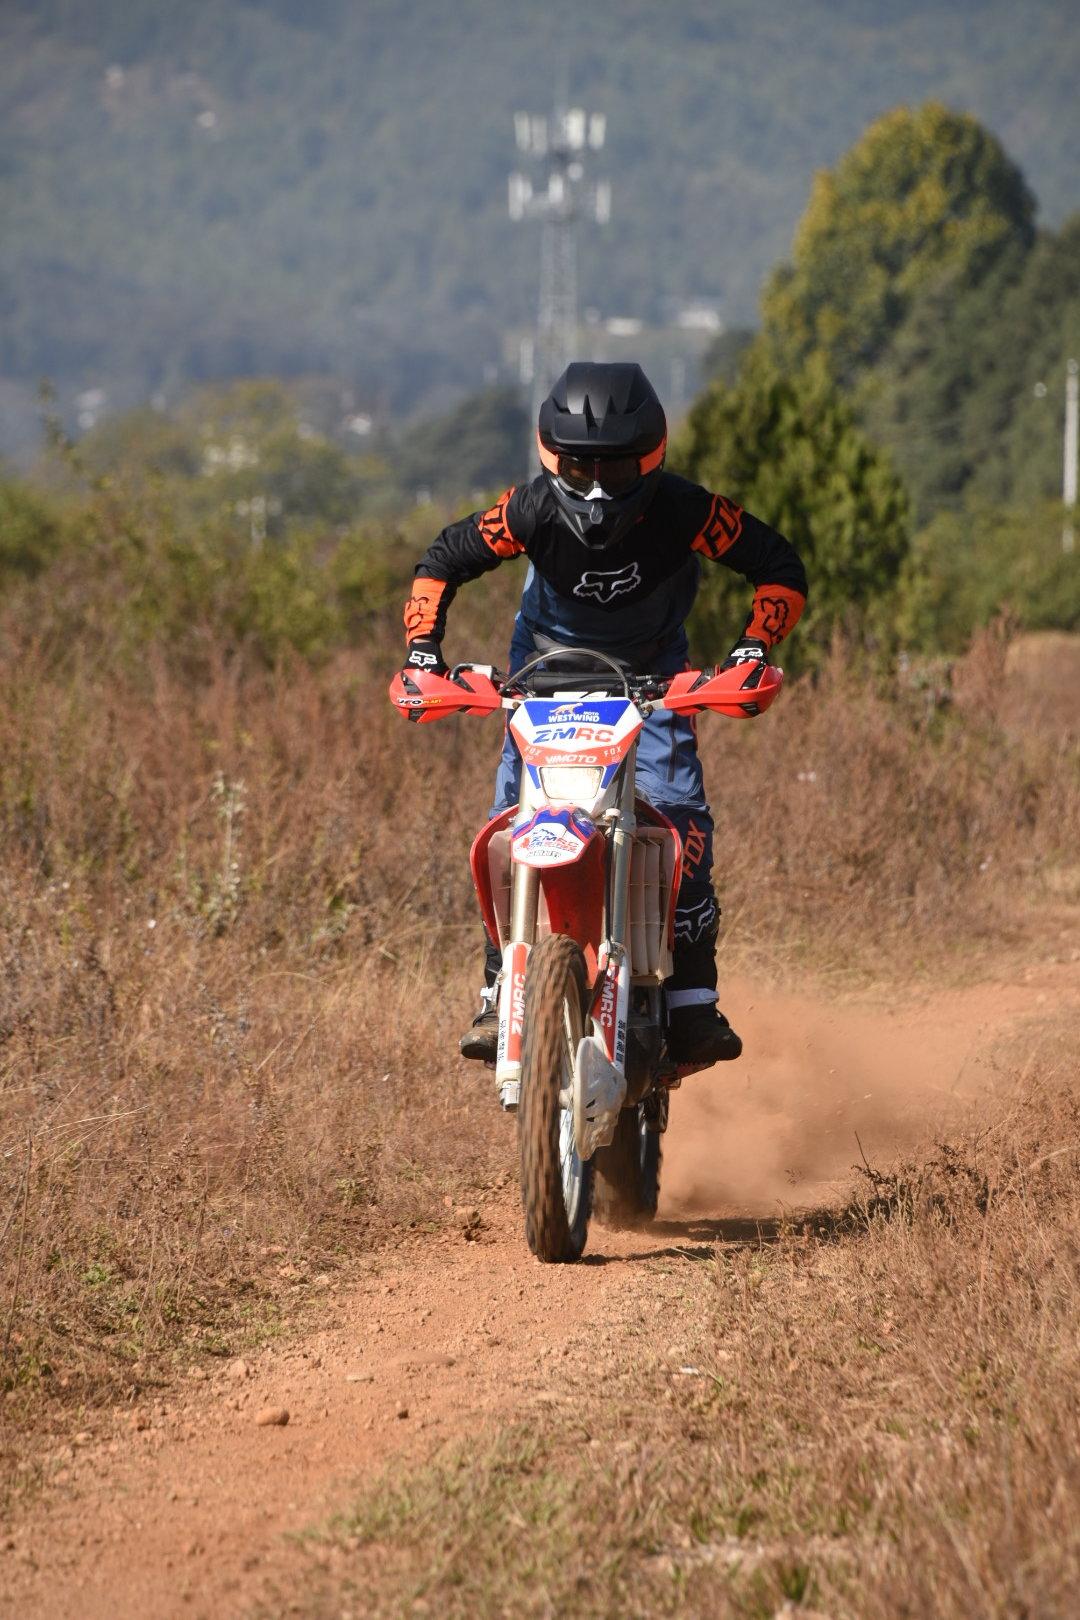 off-road riding-4.jpg